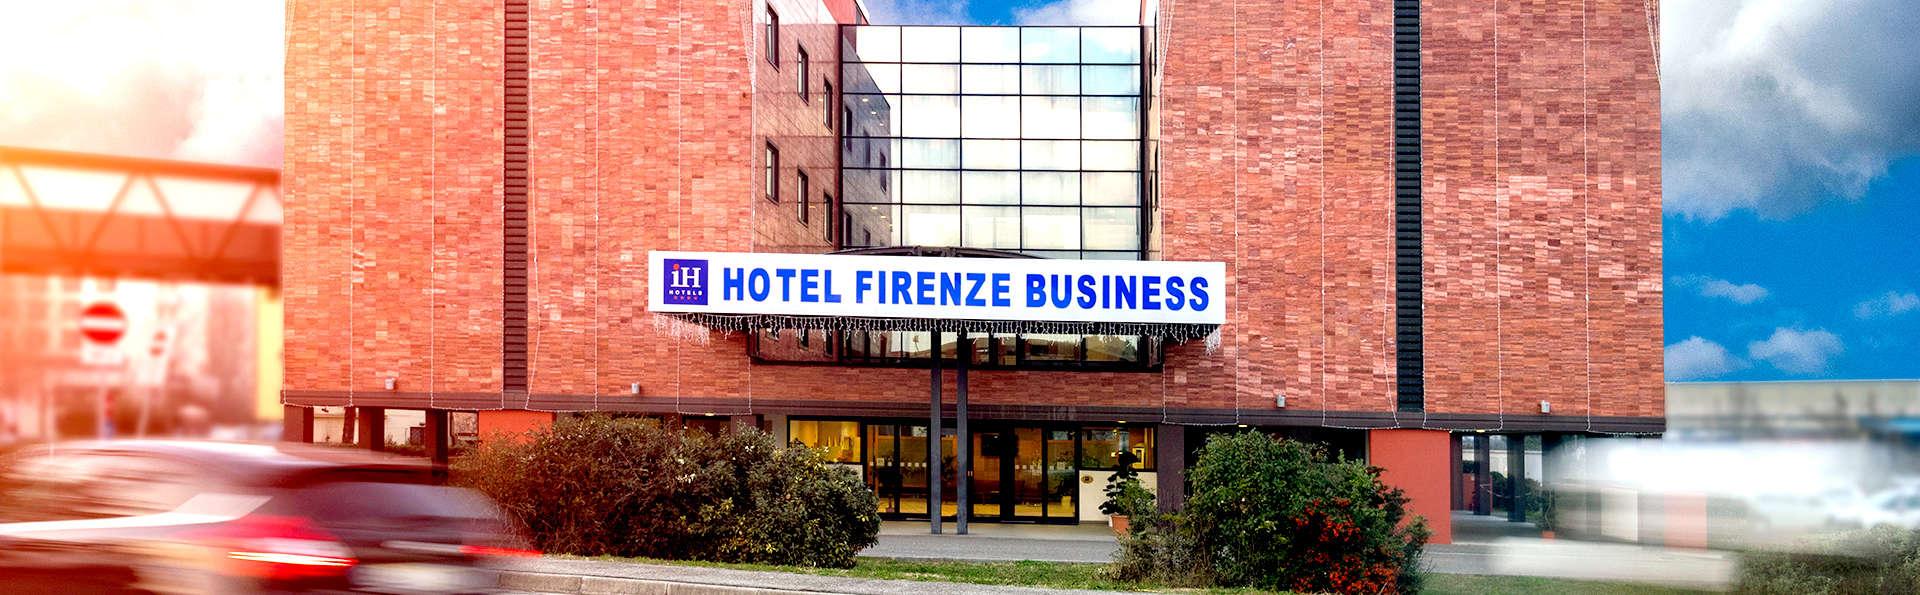 IH Hotels Firenze Business - Edit_Front2.jpg